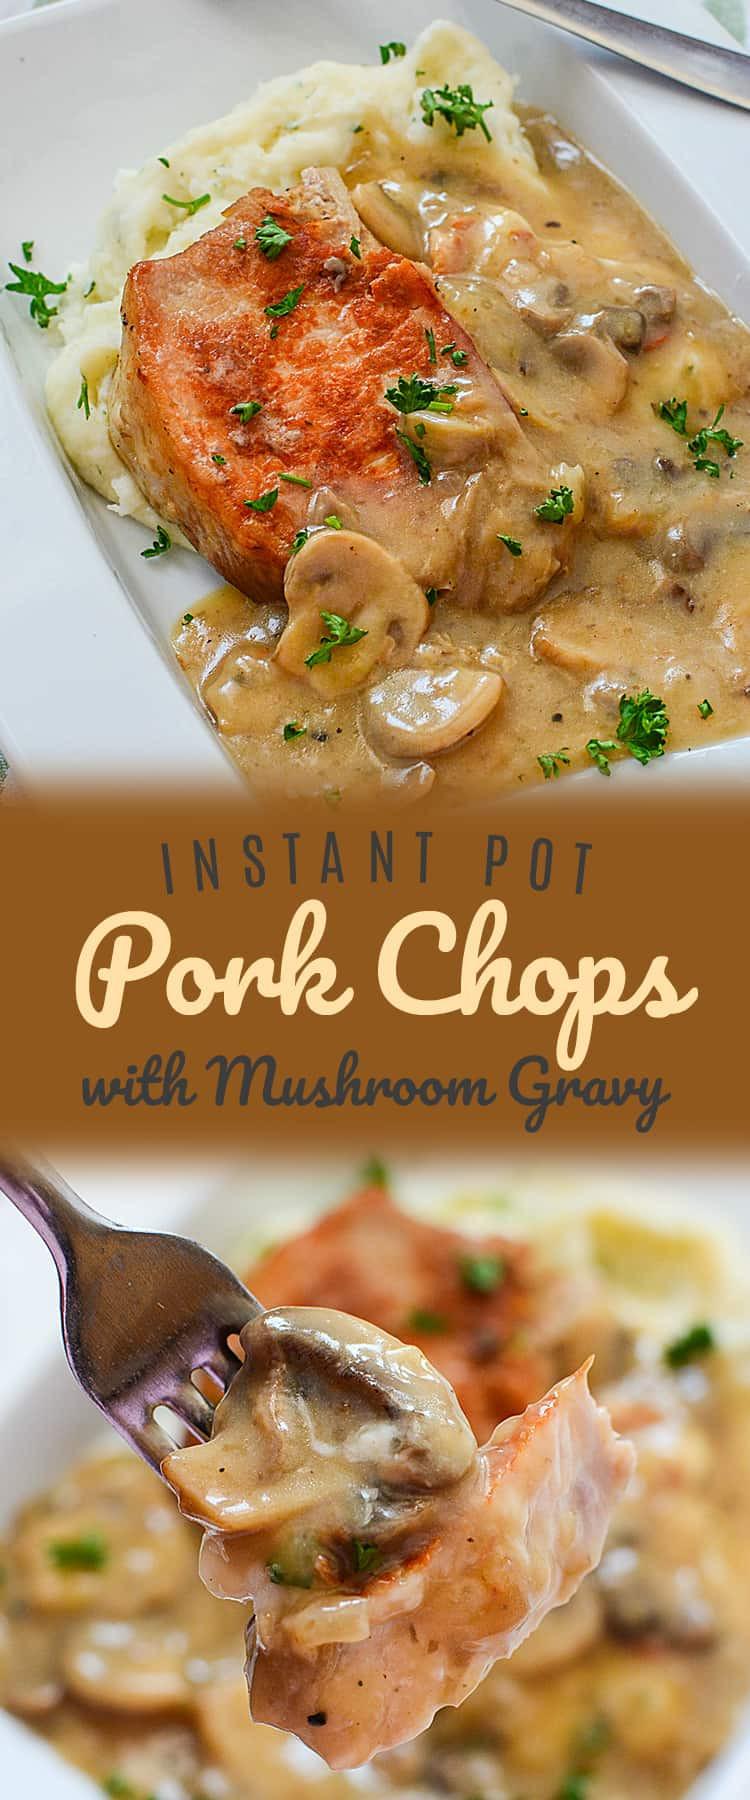 Pork Chops In Instant Pot  Instant Pot Pork Chops with Mushroom Gravy